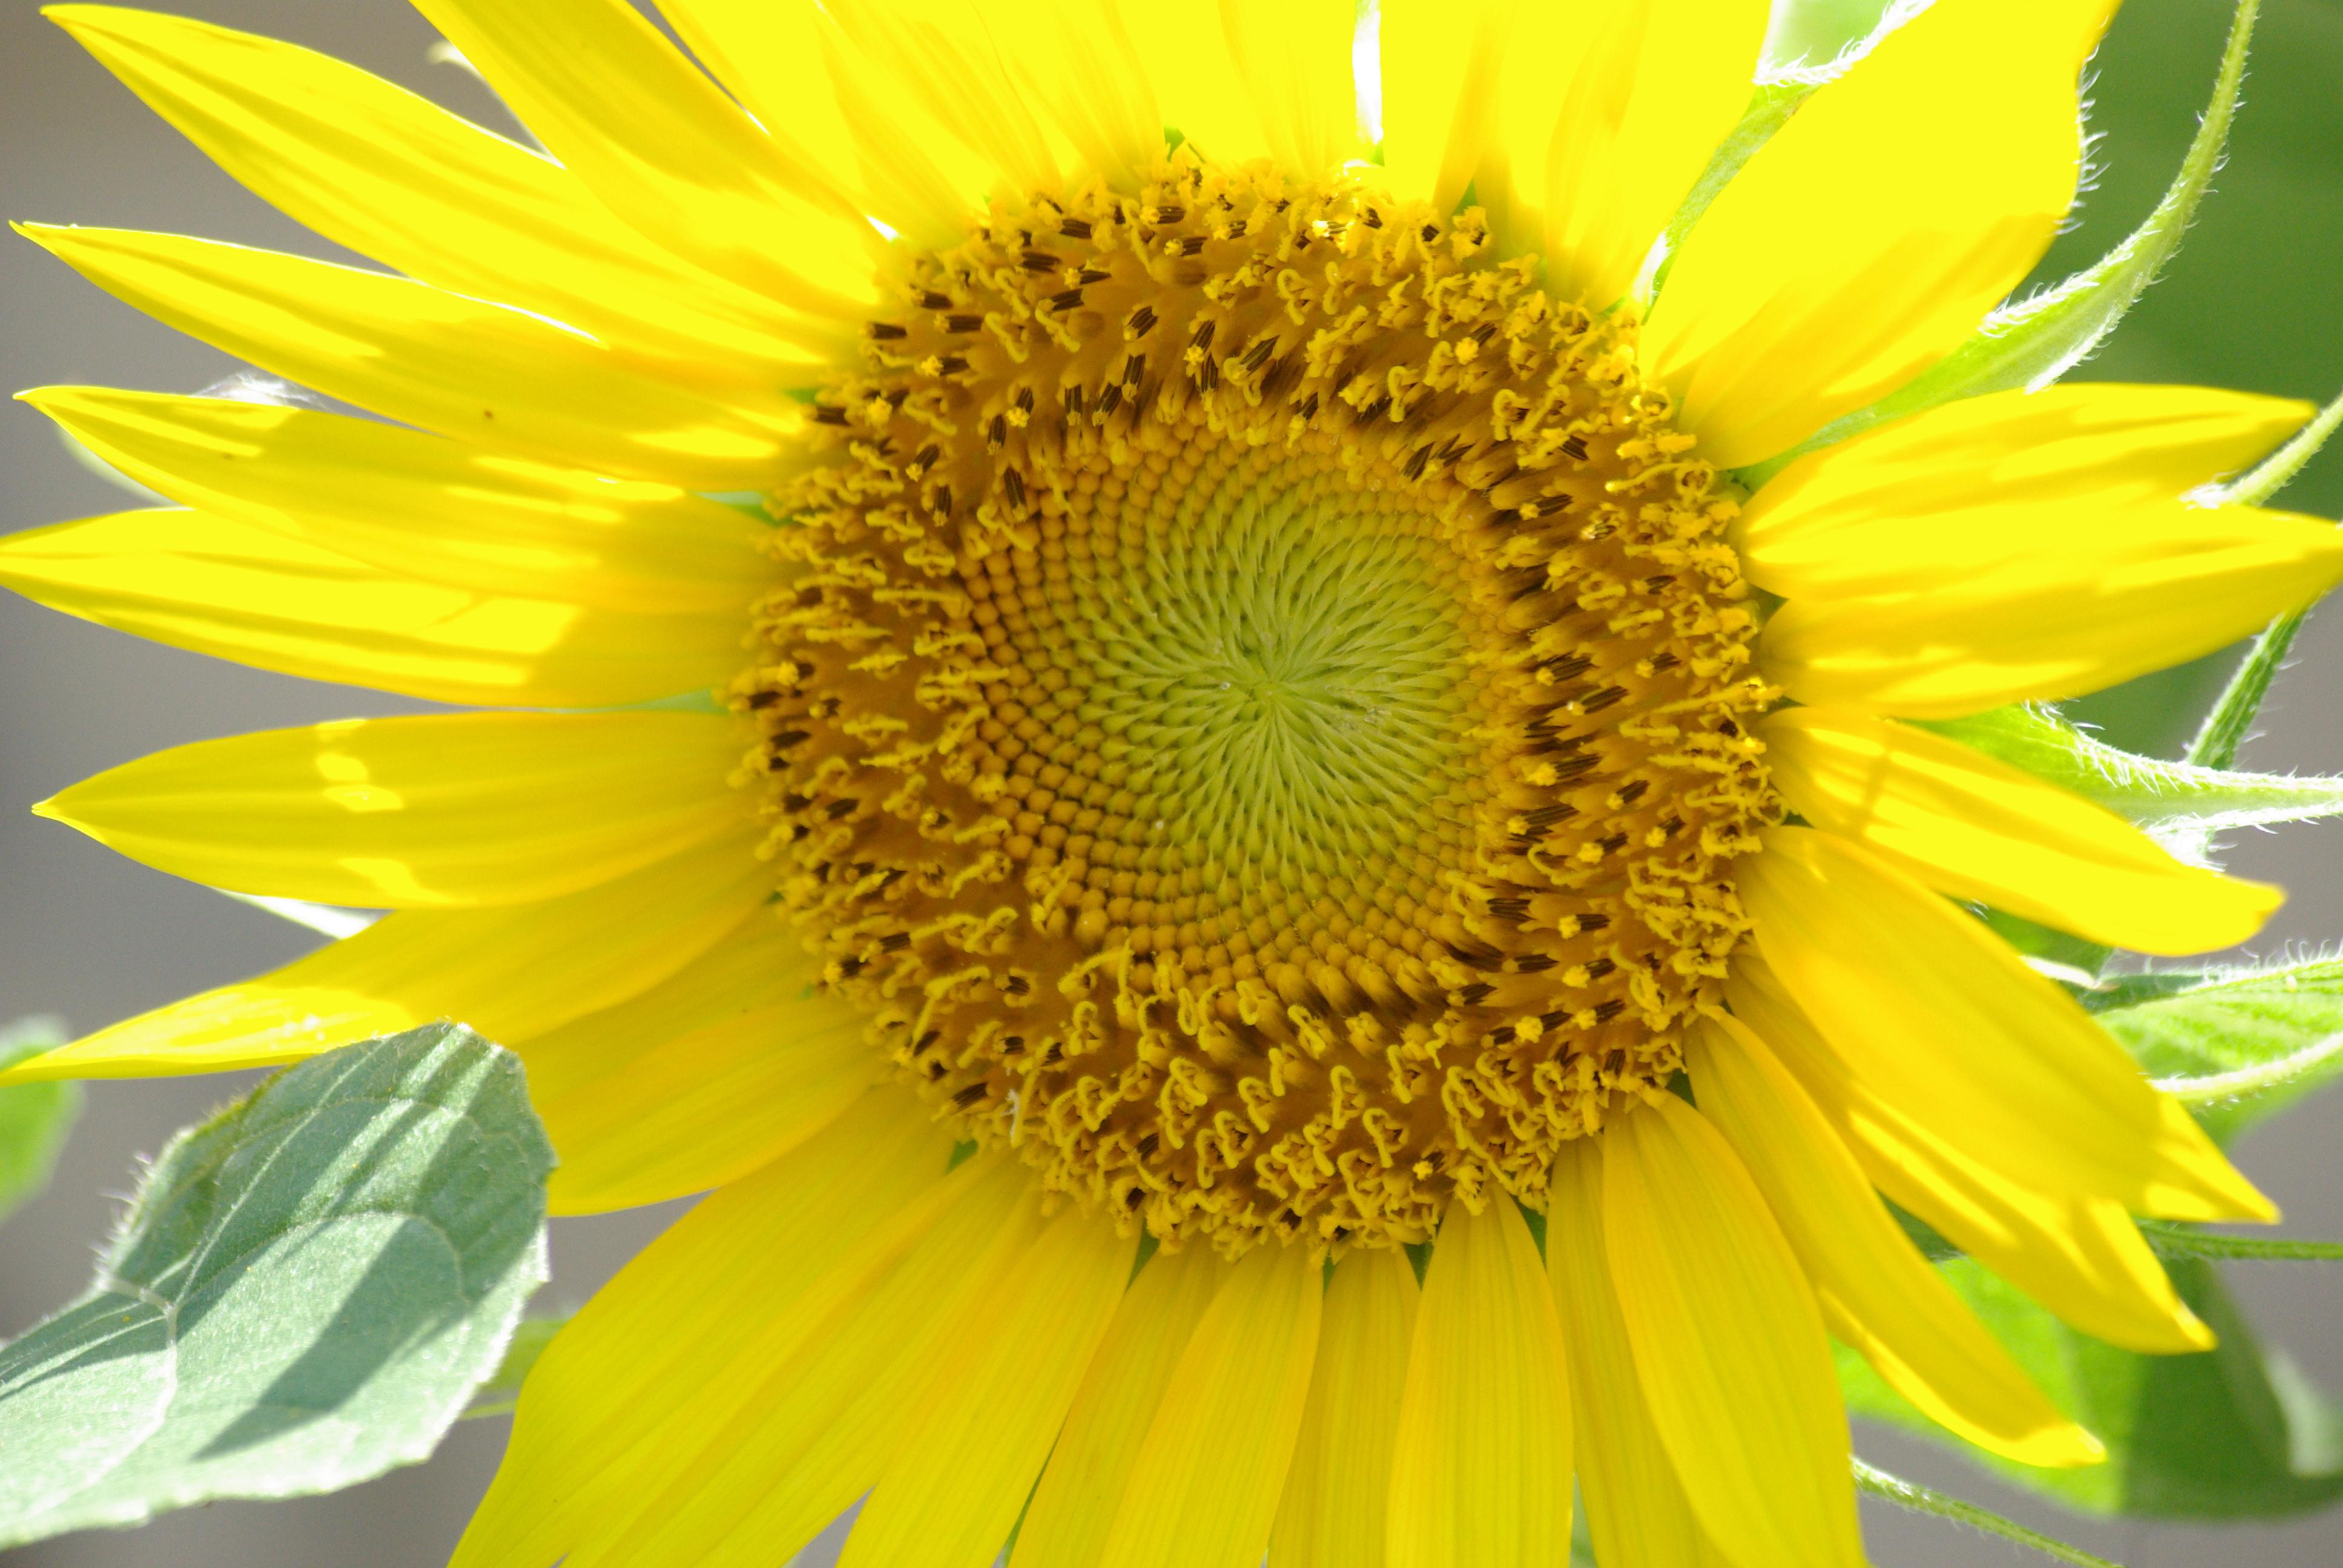 A bird-planted sunflower in Kathryn's garden - copyright 2009, Ed Darrell